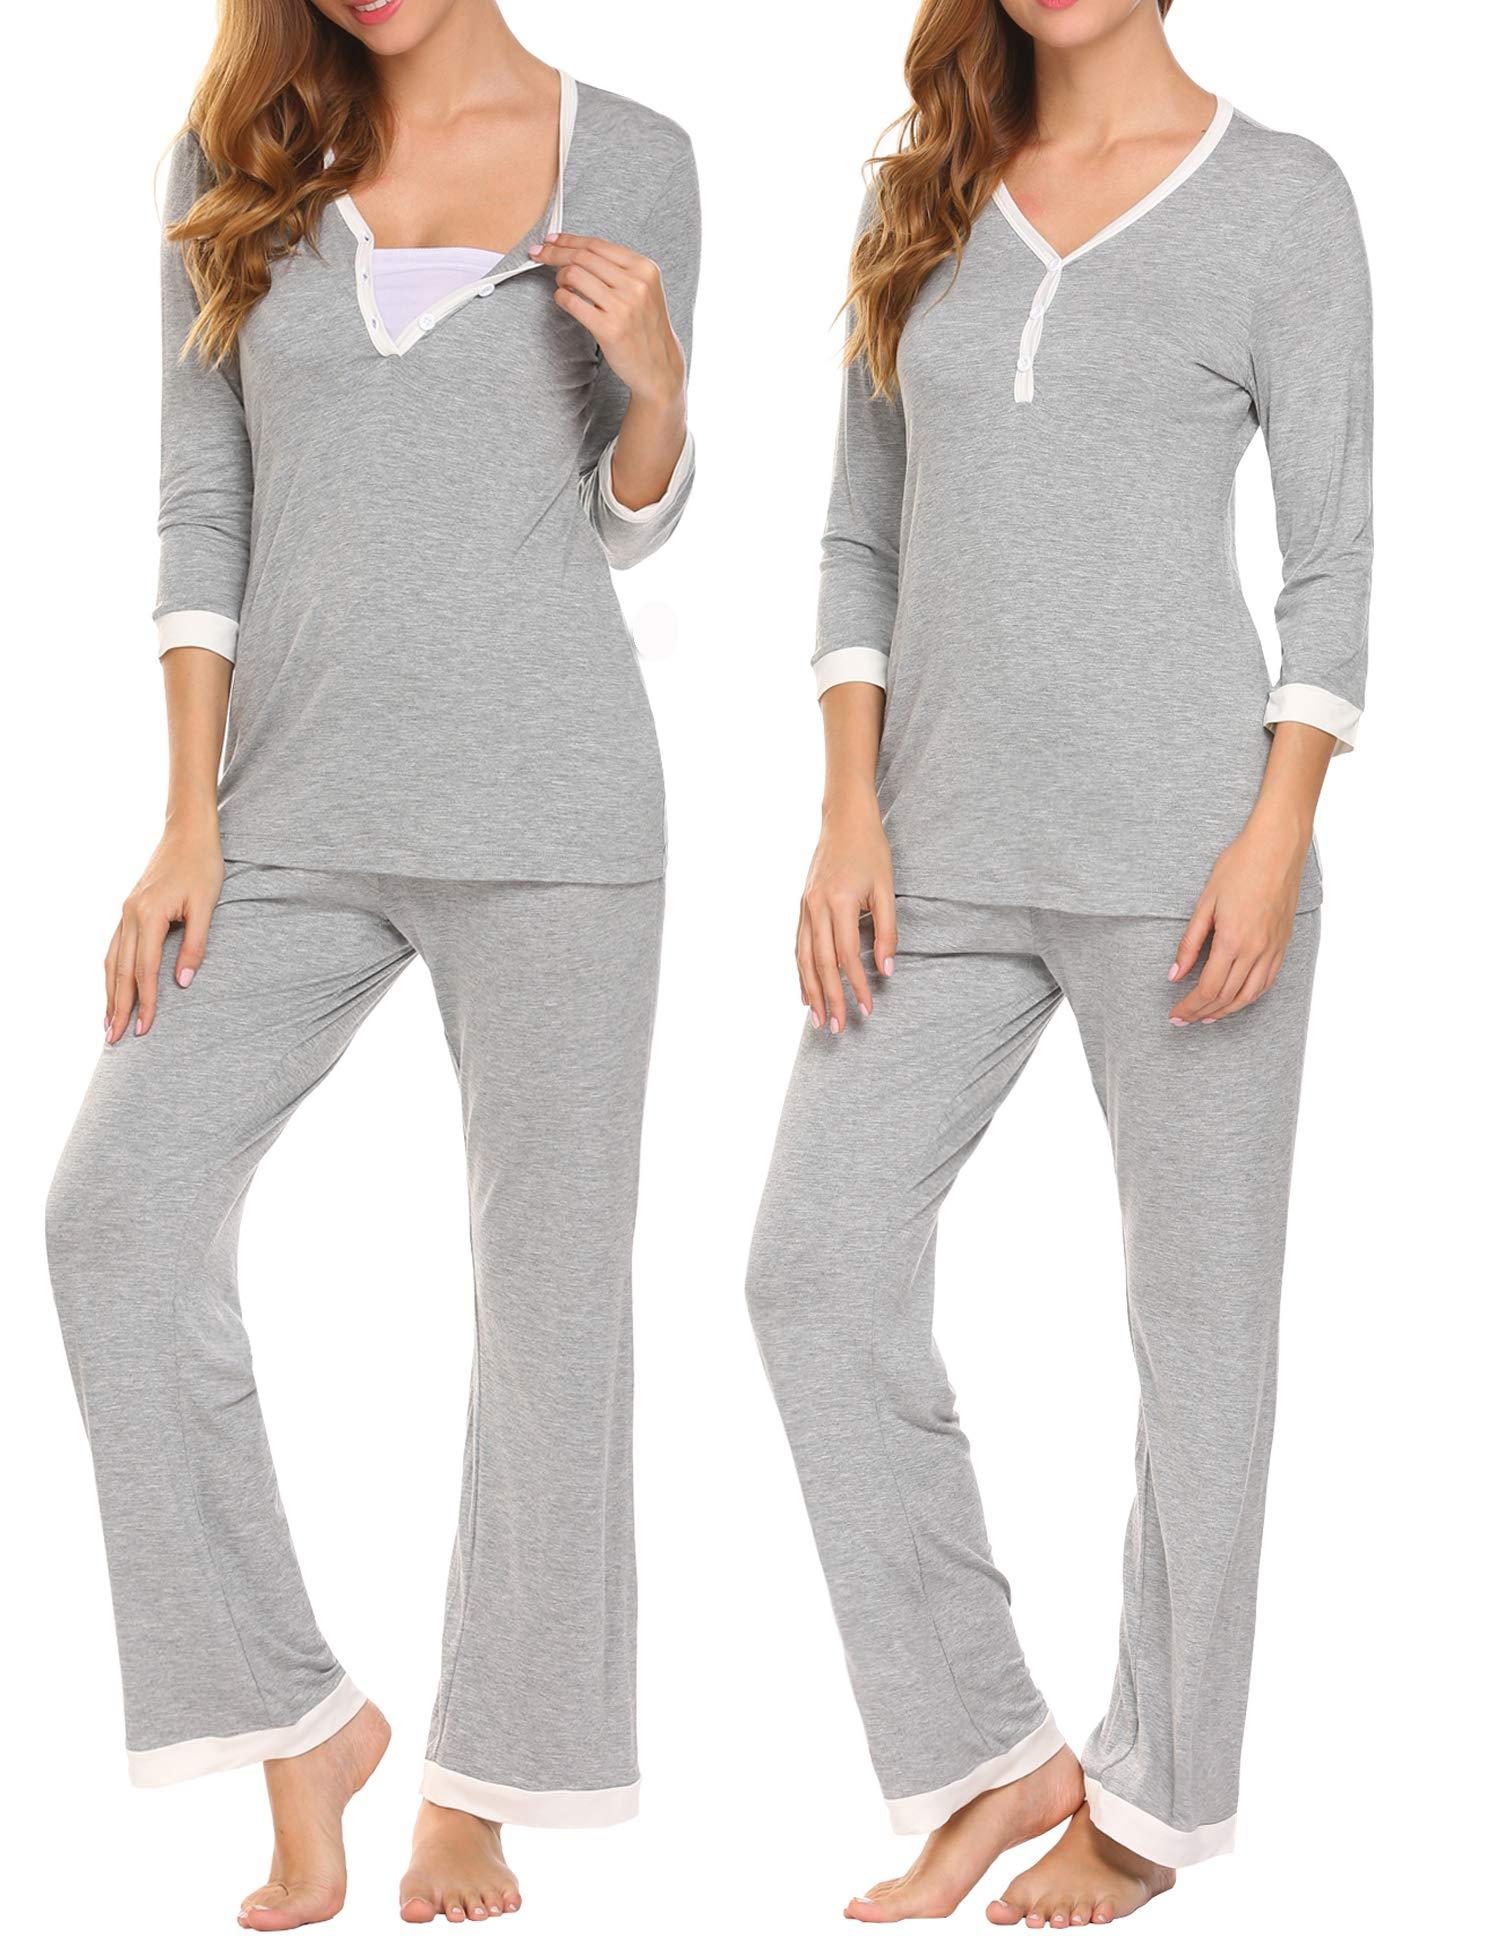 MAXMODA Women's Soft 3/4 Sleeve Maternity Nursing Hospital Set Sleepwear Pajamas Set Breastfeeding Nightgown Set S-XXL (Large, Sterling Pewter)